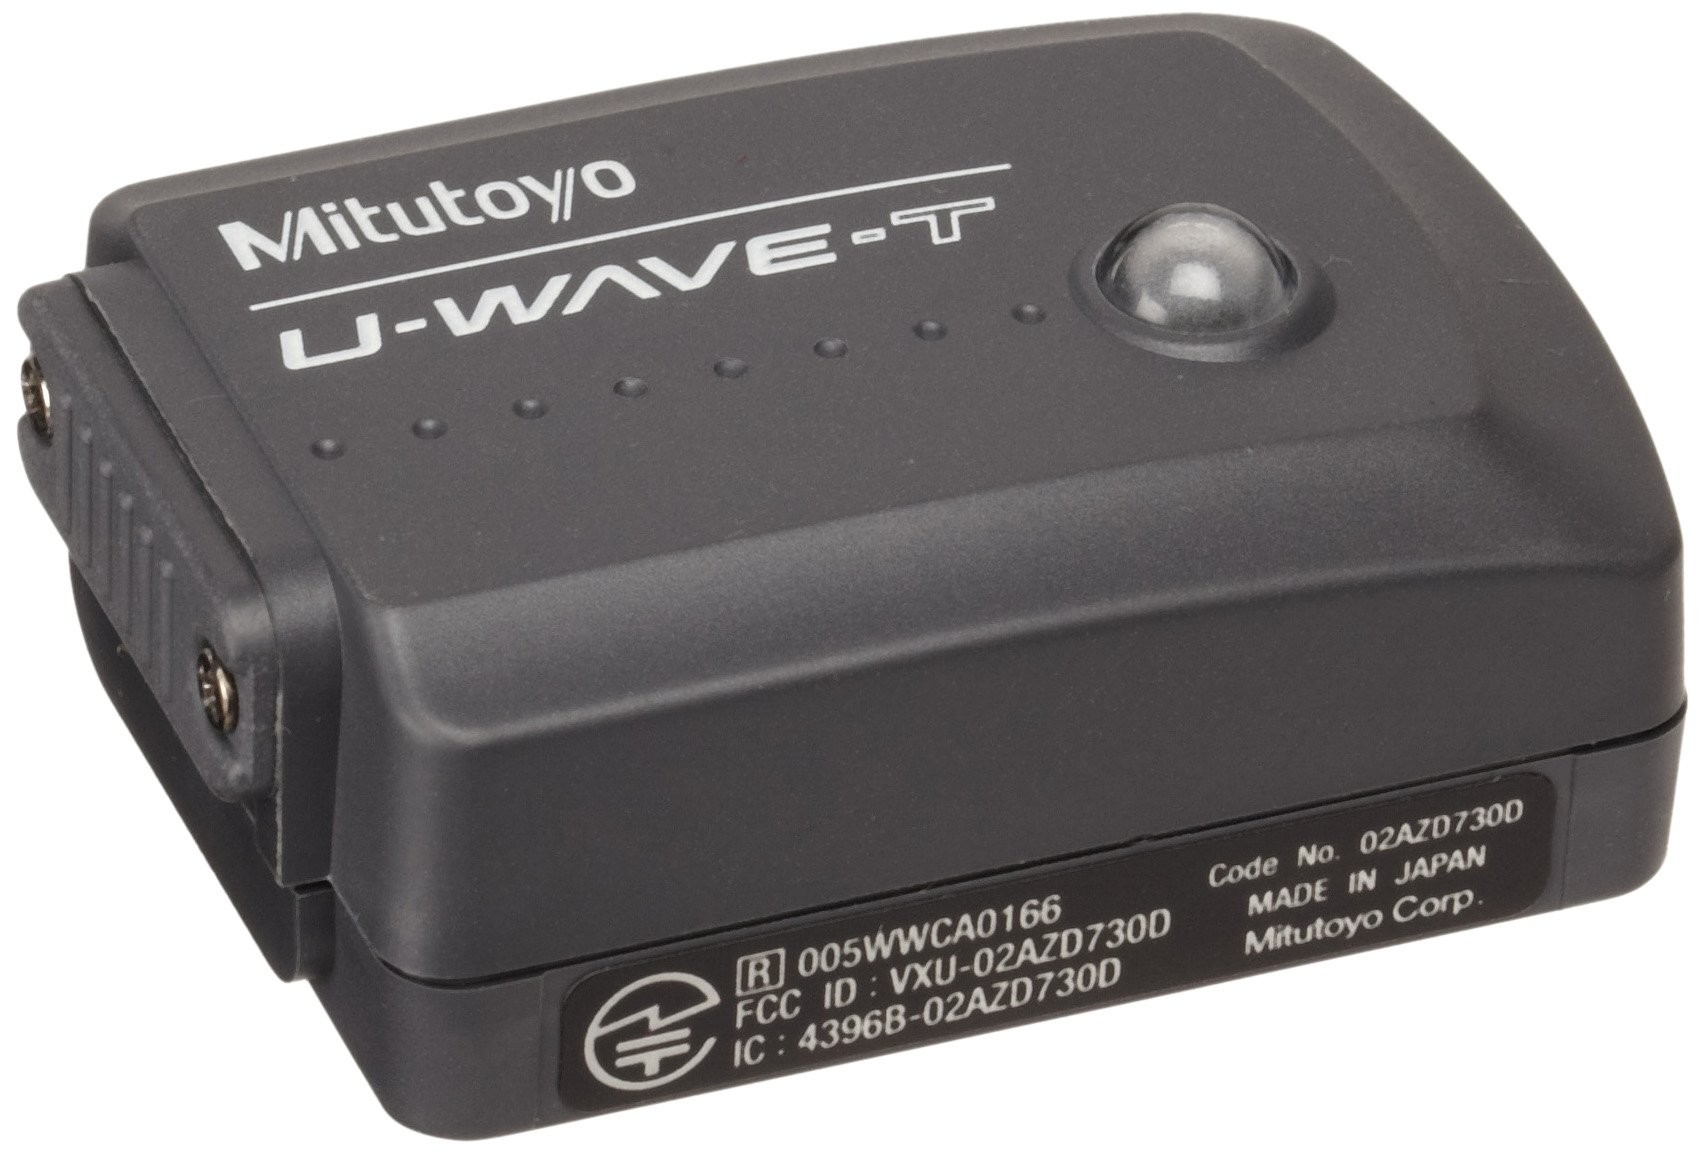 Mitutoyo U-WAVE-T Wireless Transmitter IP67